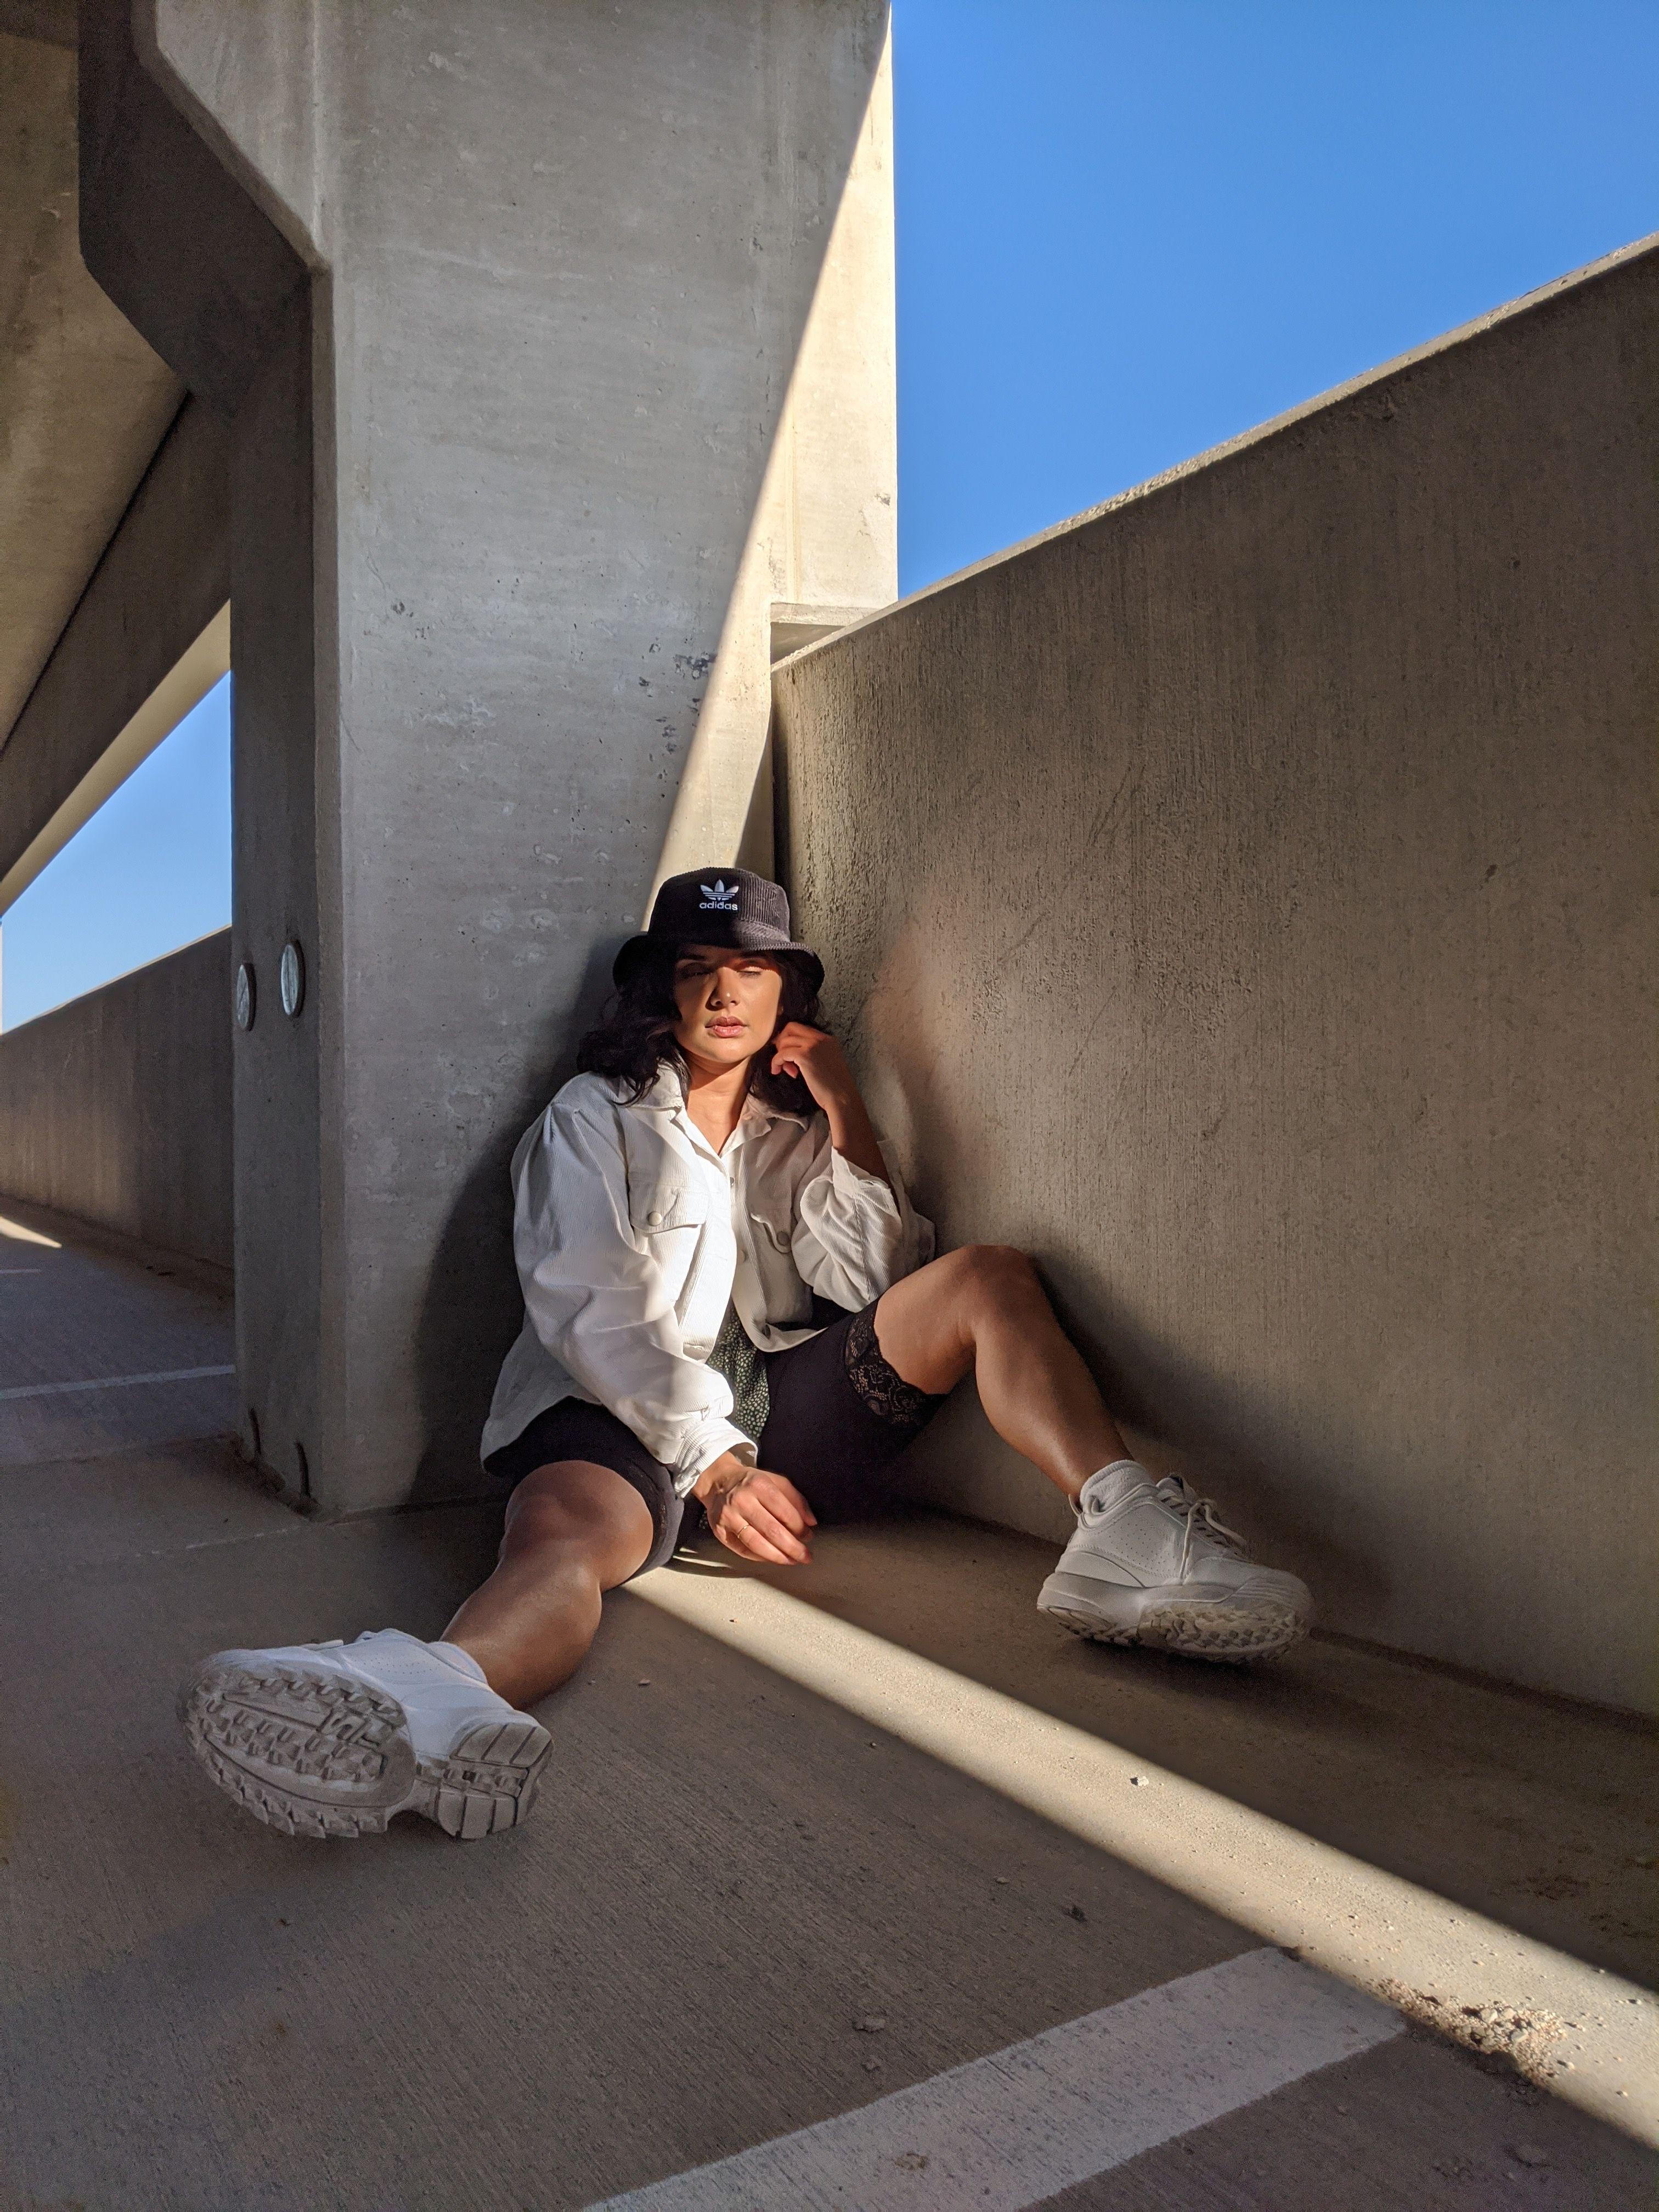 Photoshoot Ideas In 2020 Rooftop Photoshoot Fashion Photography Poses Street Fashion Photography